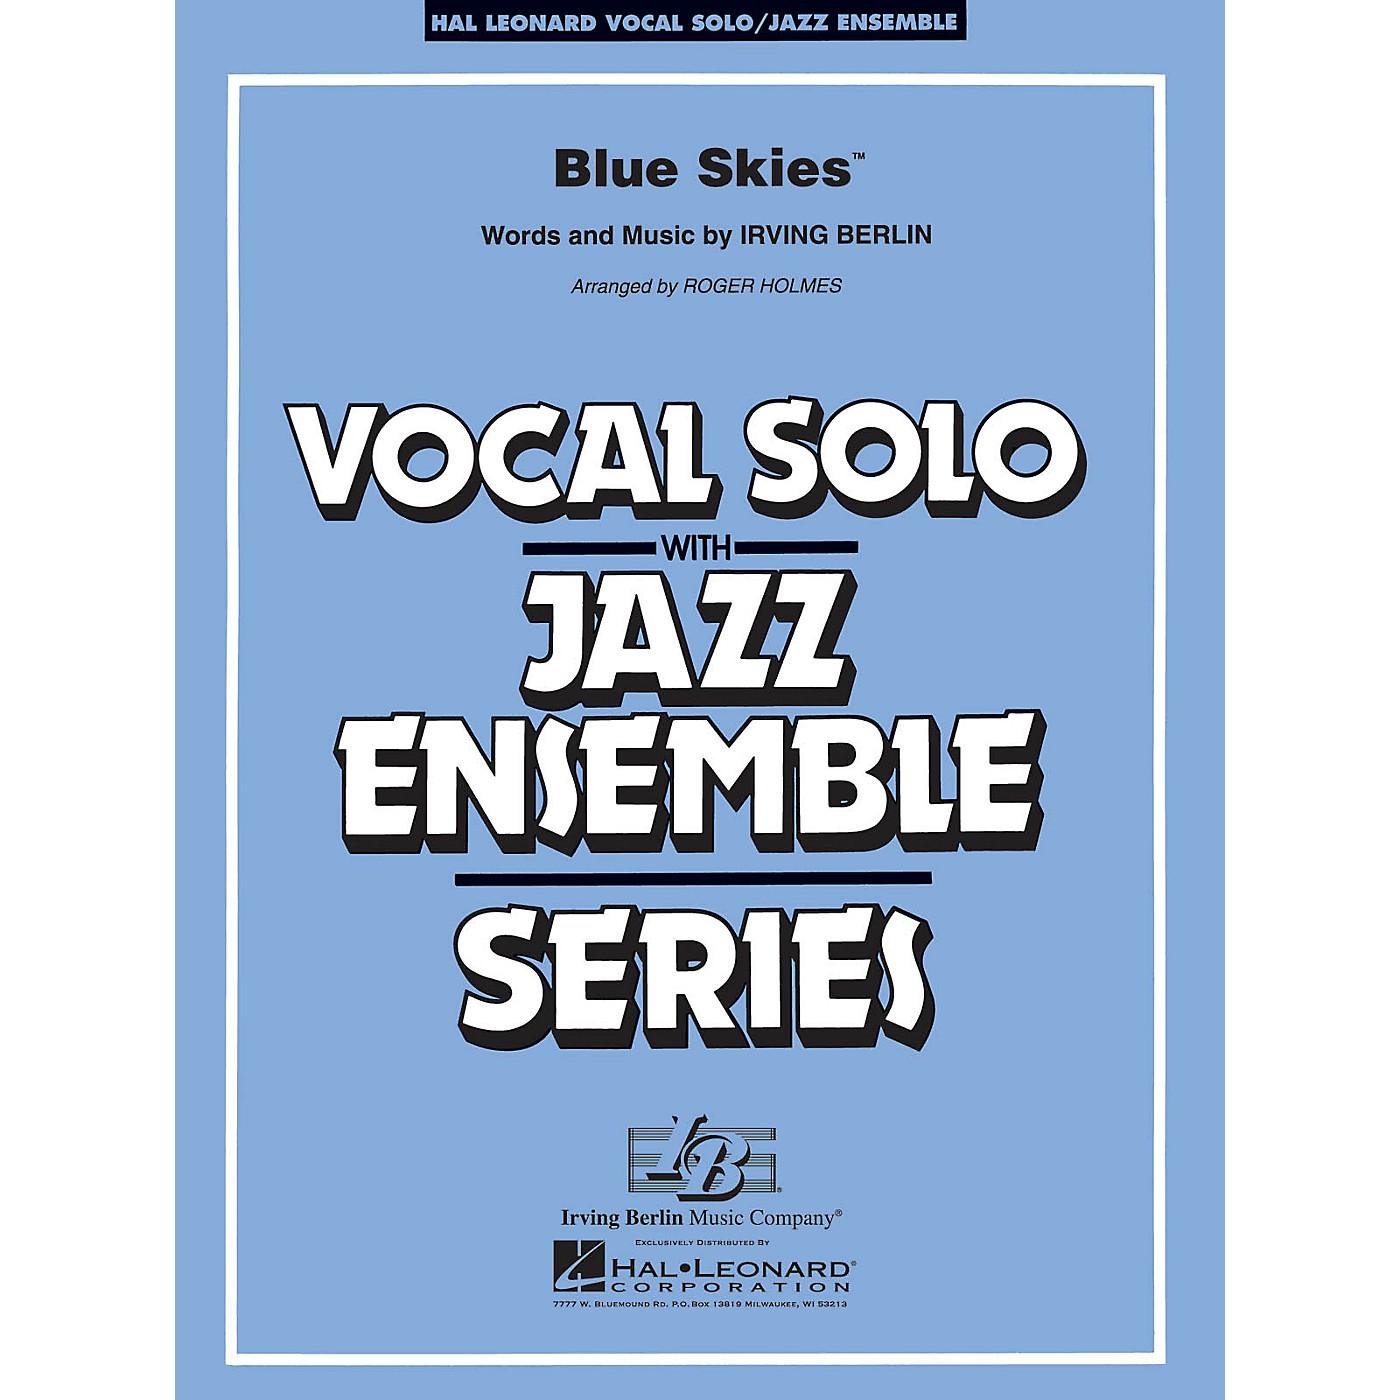 Hal Leonard Blue Skies (Key: Cmi) Jazz Band Level 3-4 Composed by Irving Berlin thumbnail